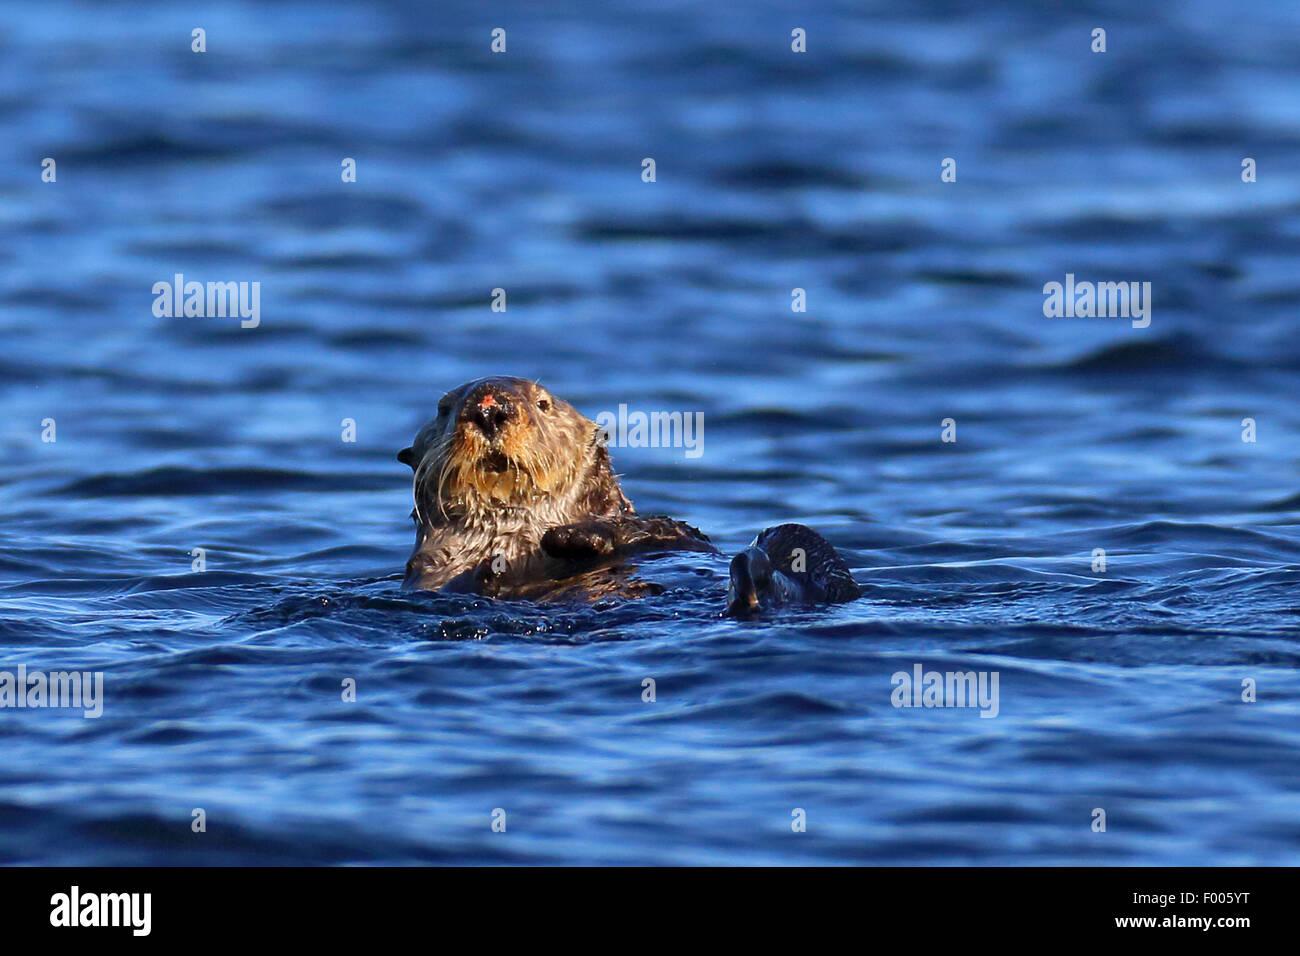 sea otter (Enhydra lutris), swimming, Canada, Vancouver Island - Stock Image